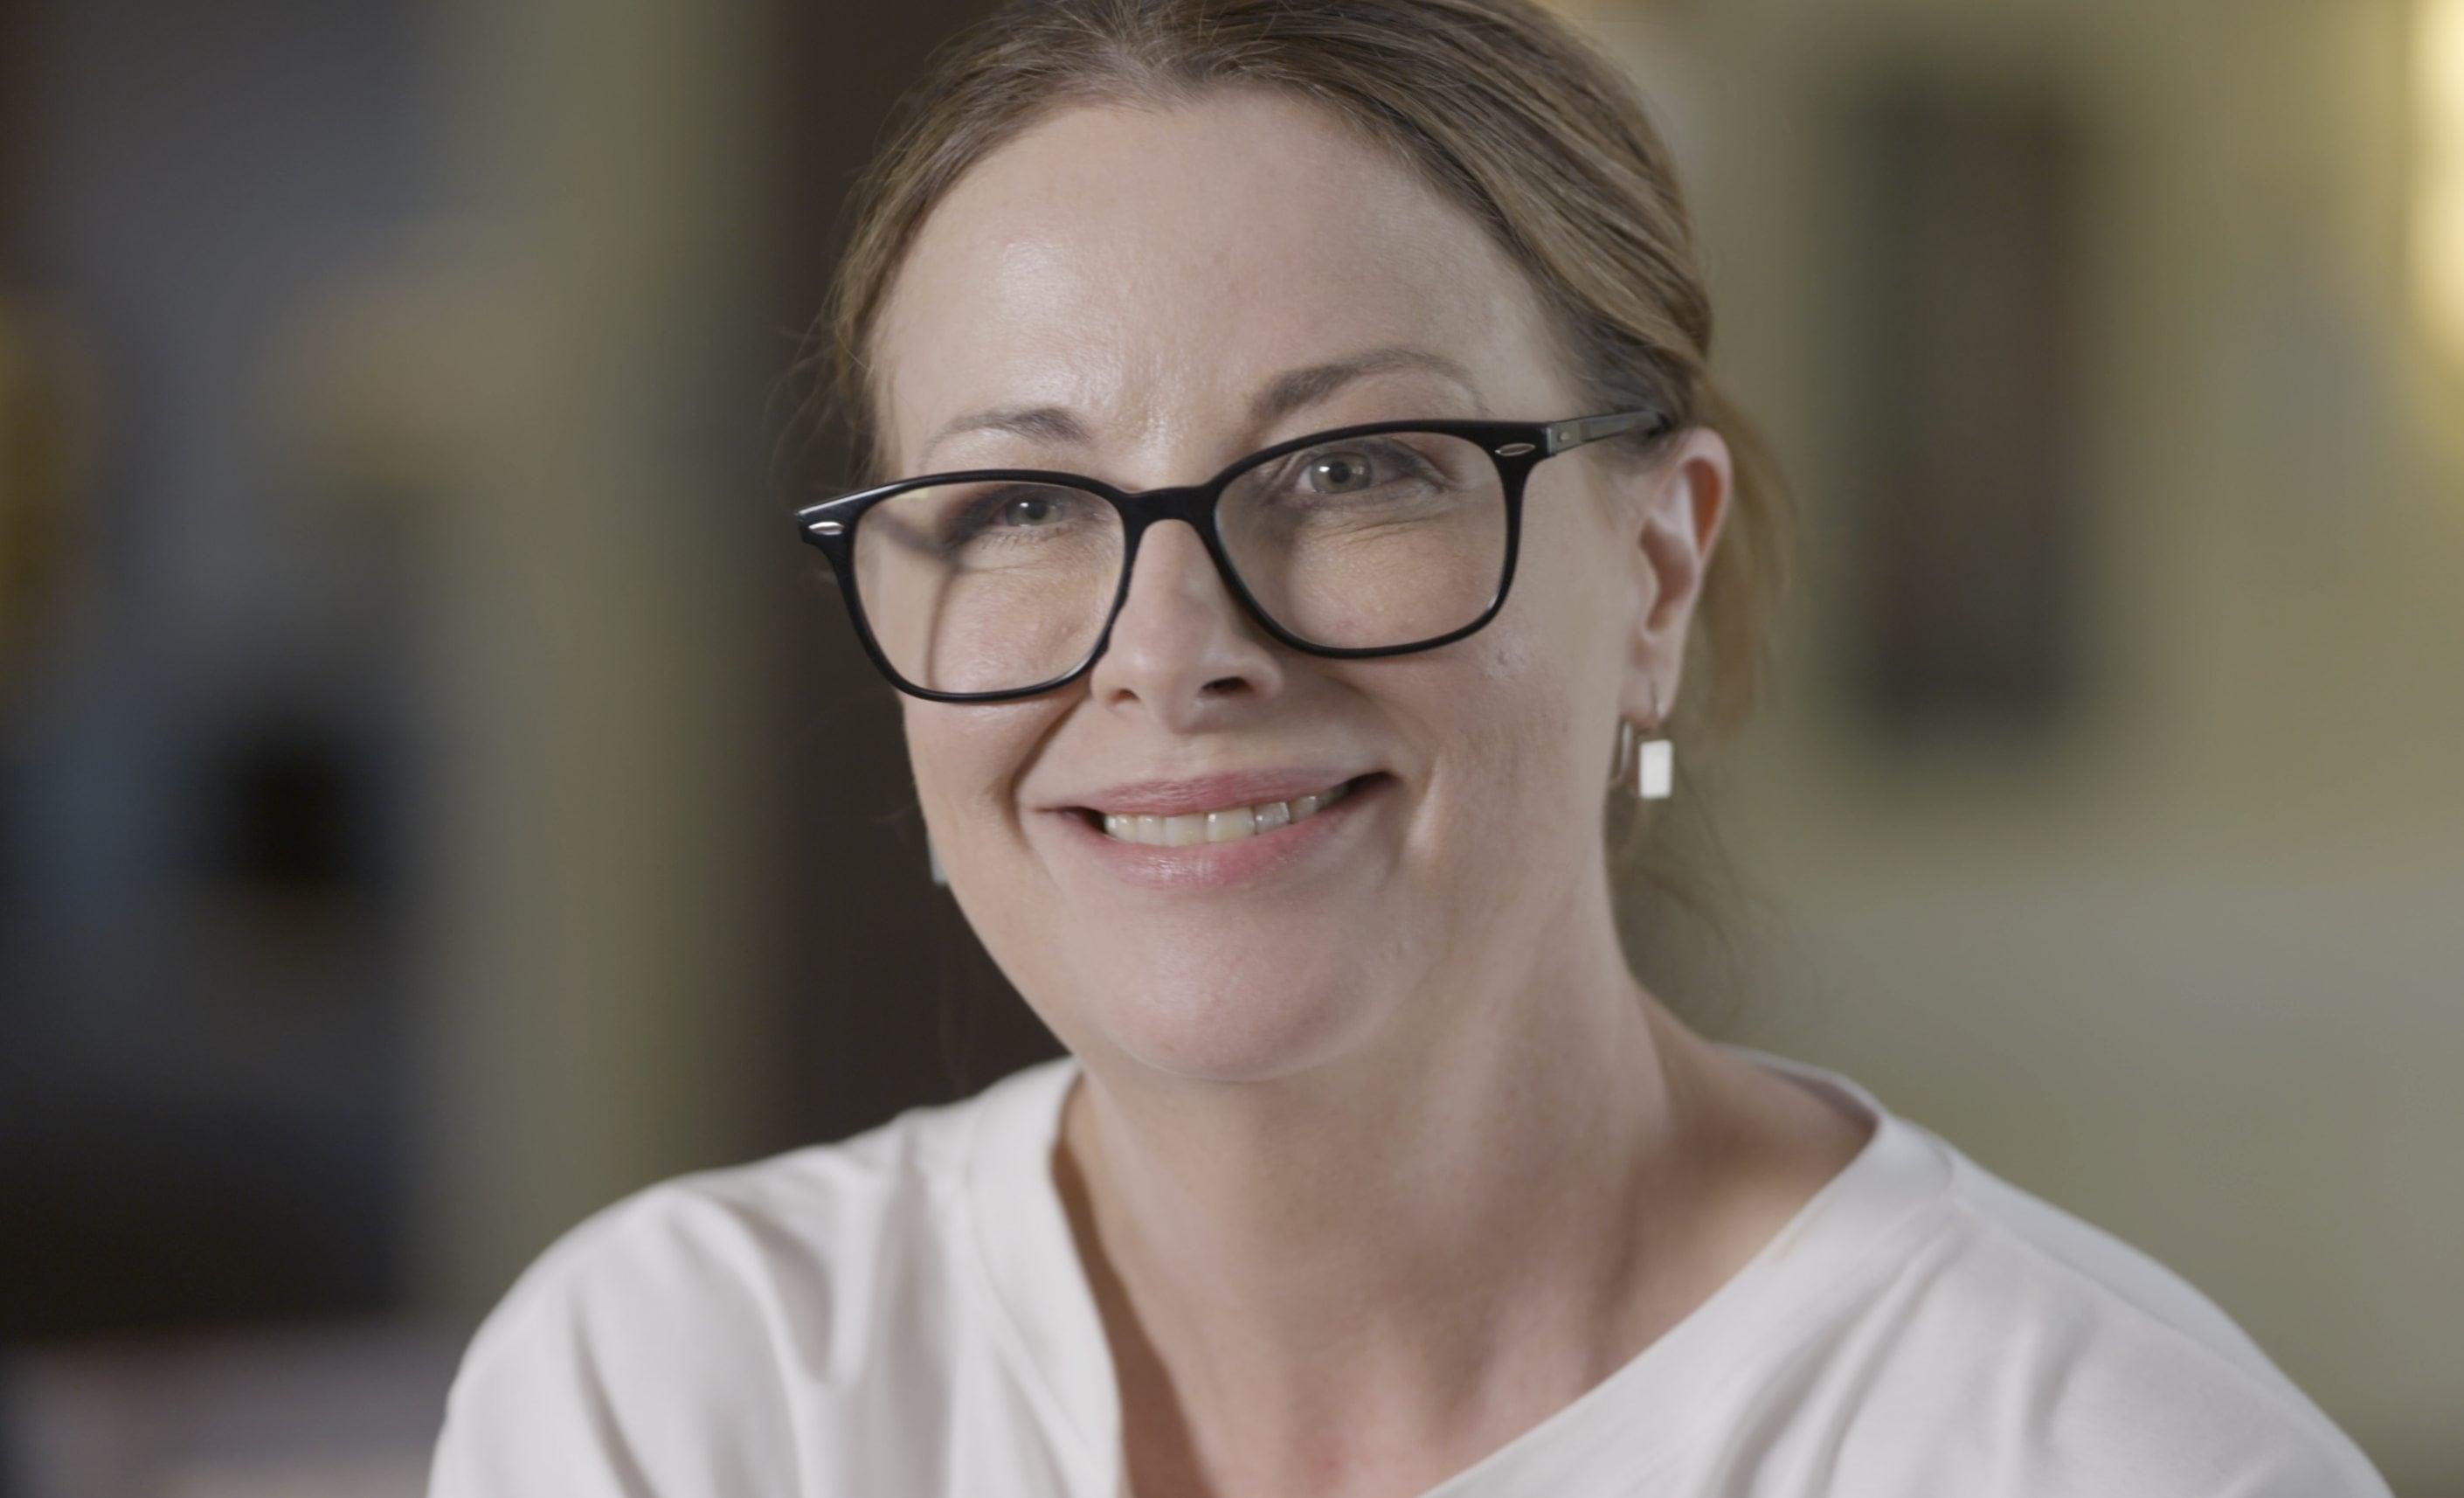 Dementia and human rights advocate Daniella Greenwood